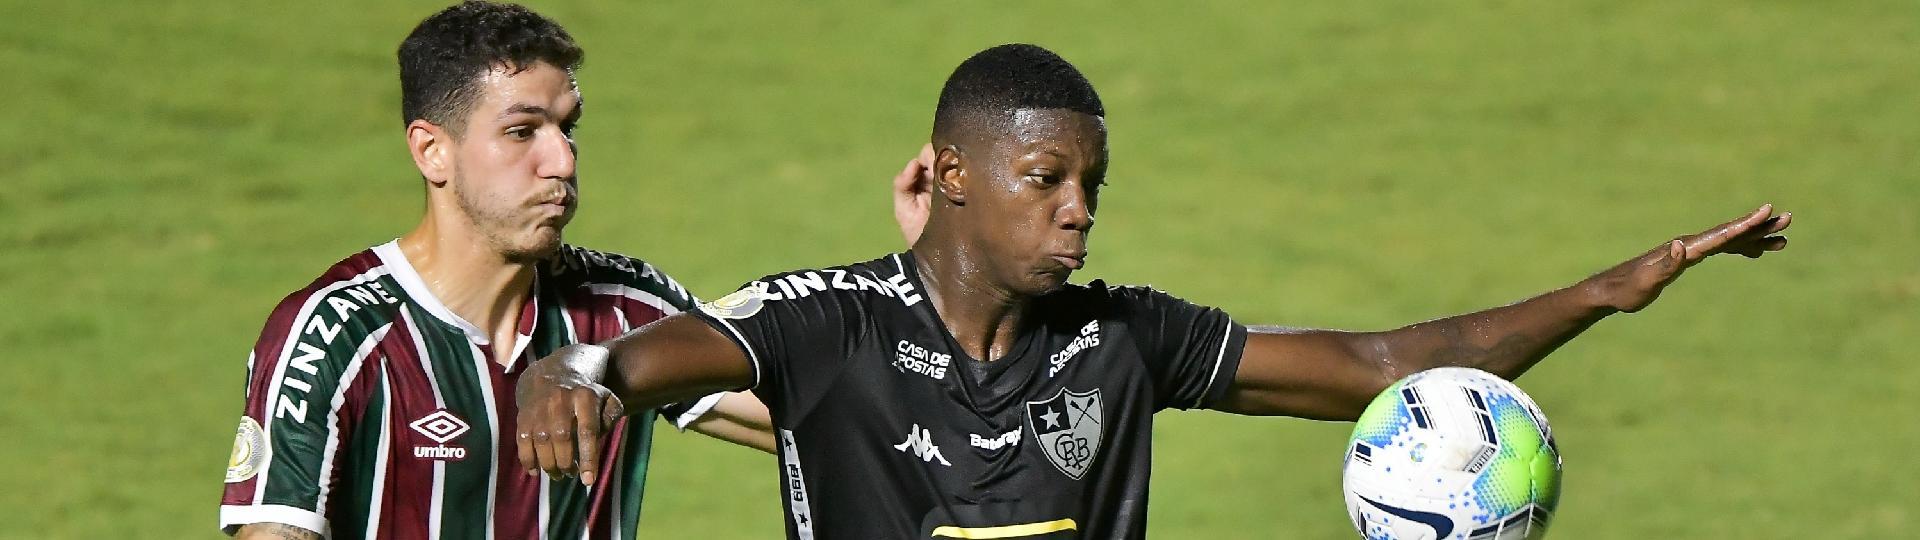 Nino e Matheus Babi disputam a bola na partida entre Fluminense x Botafogo